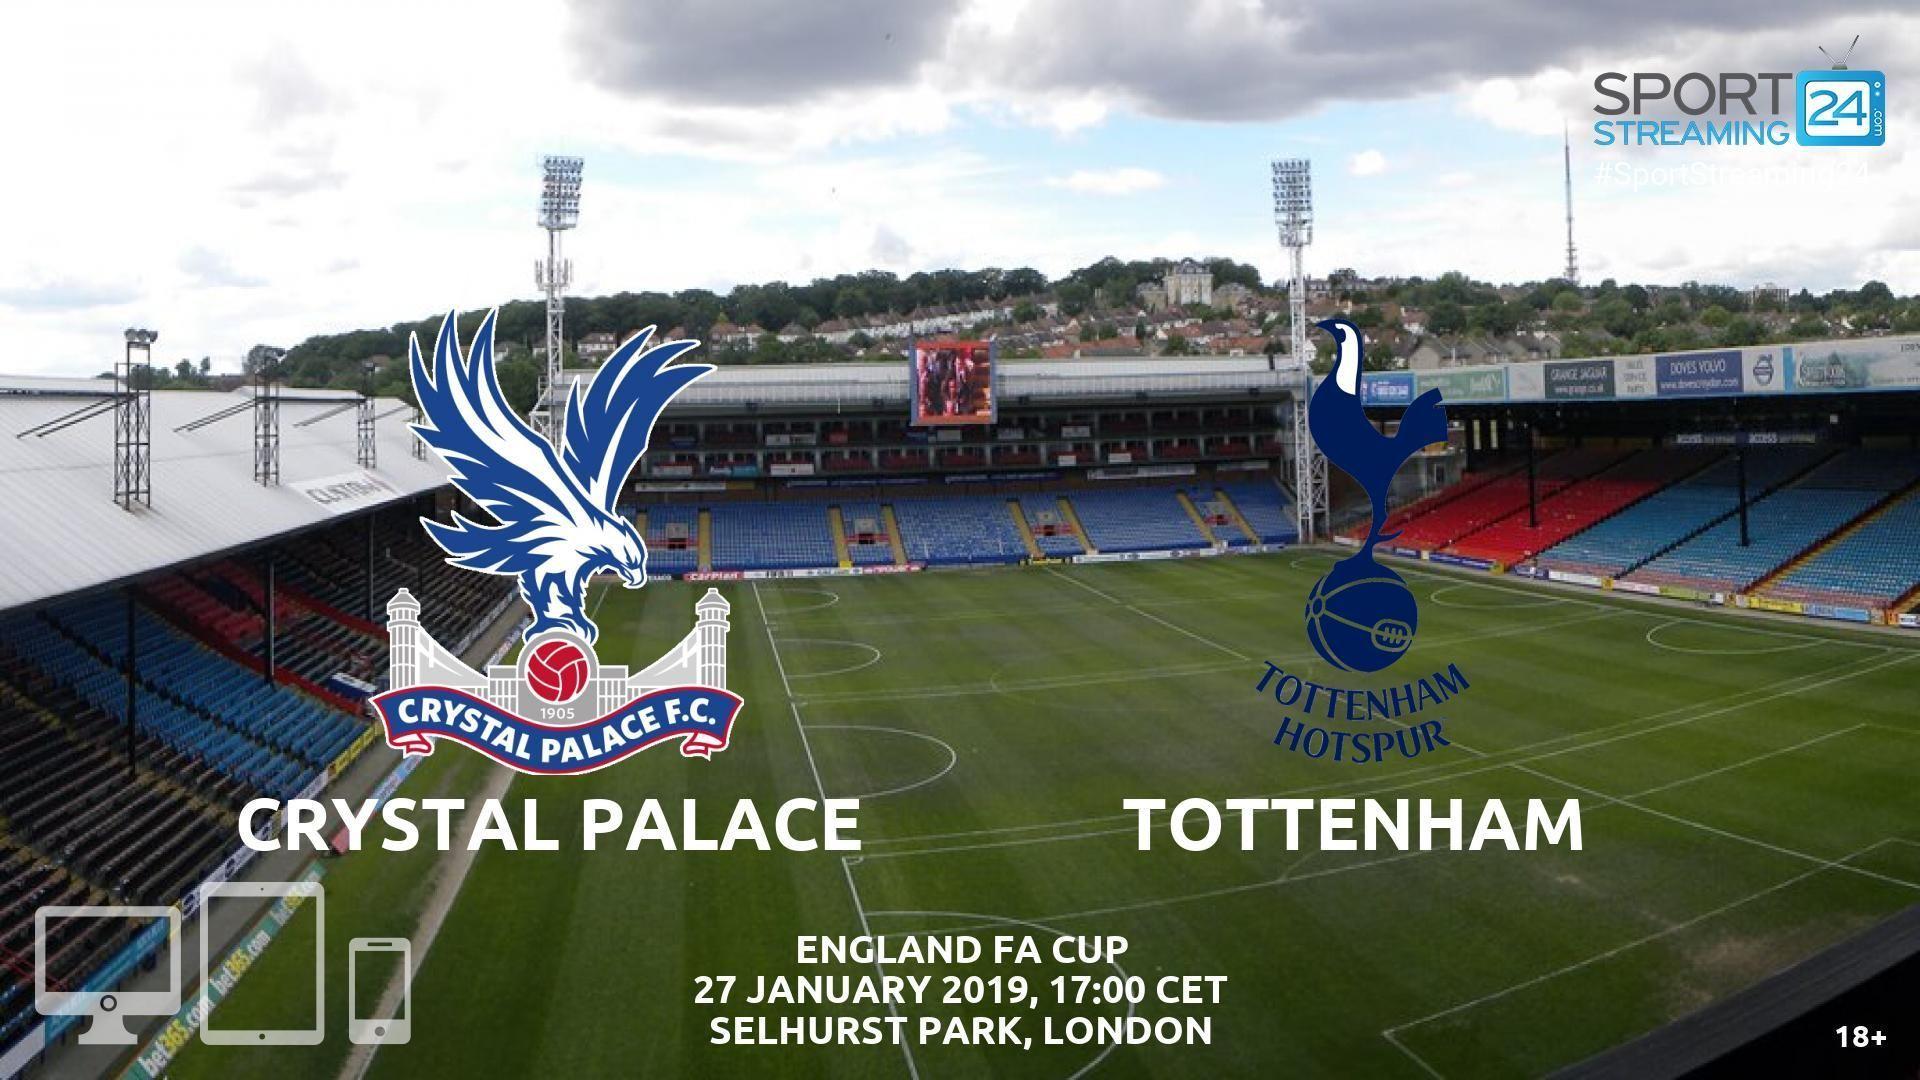 Crystal Palace v Tottenham Live Streaming Football